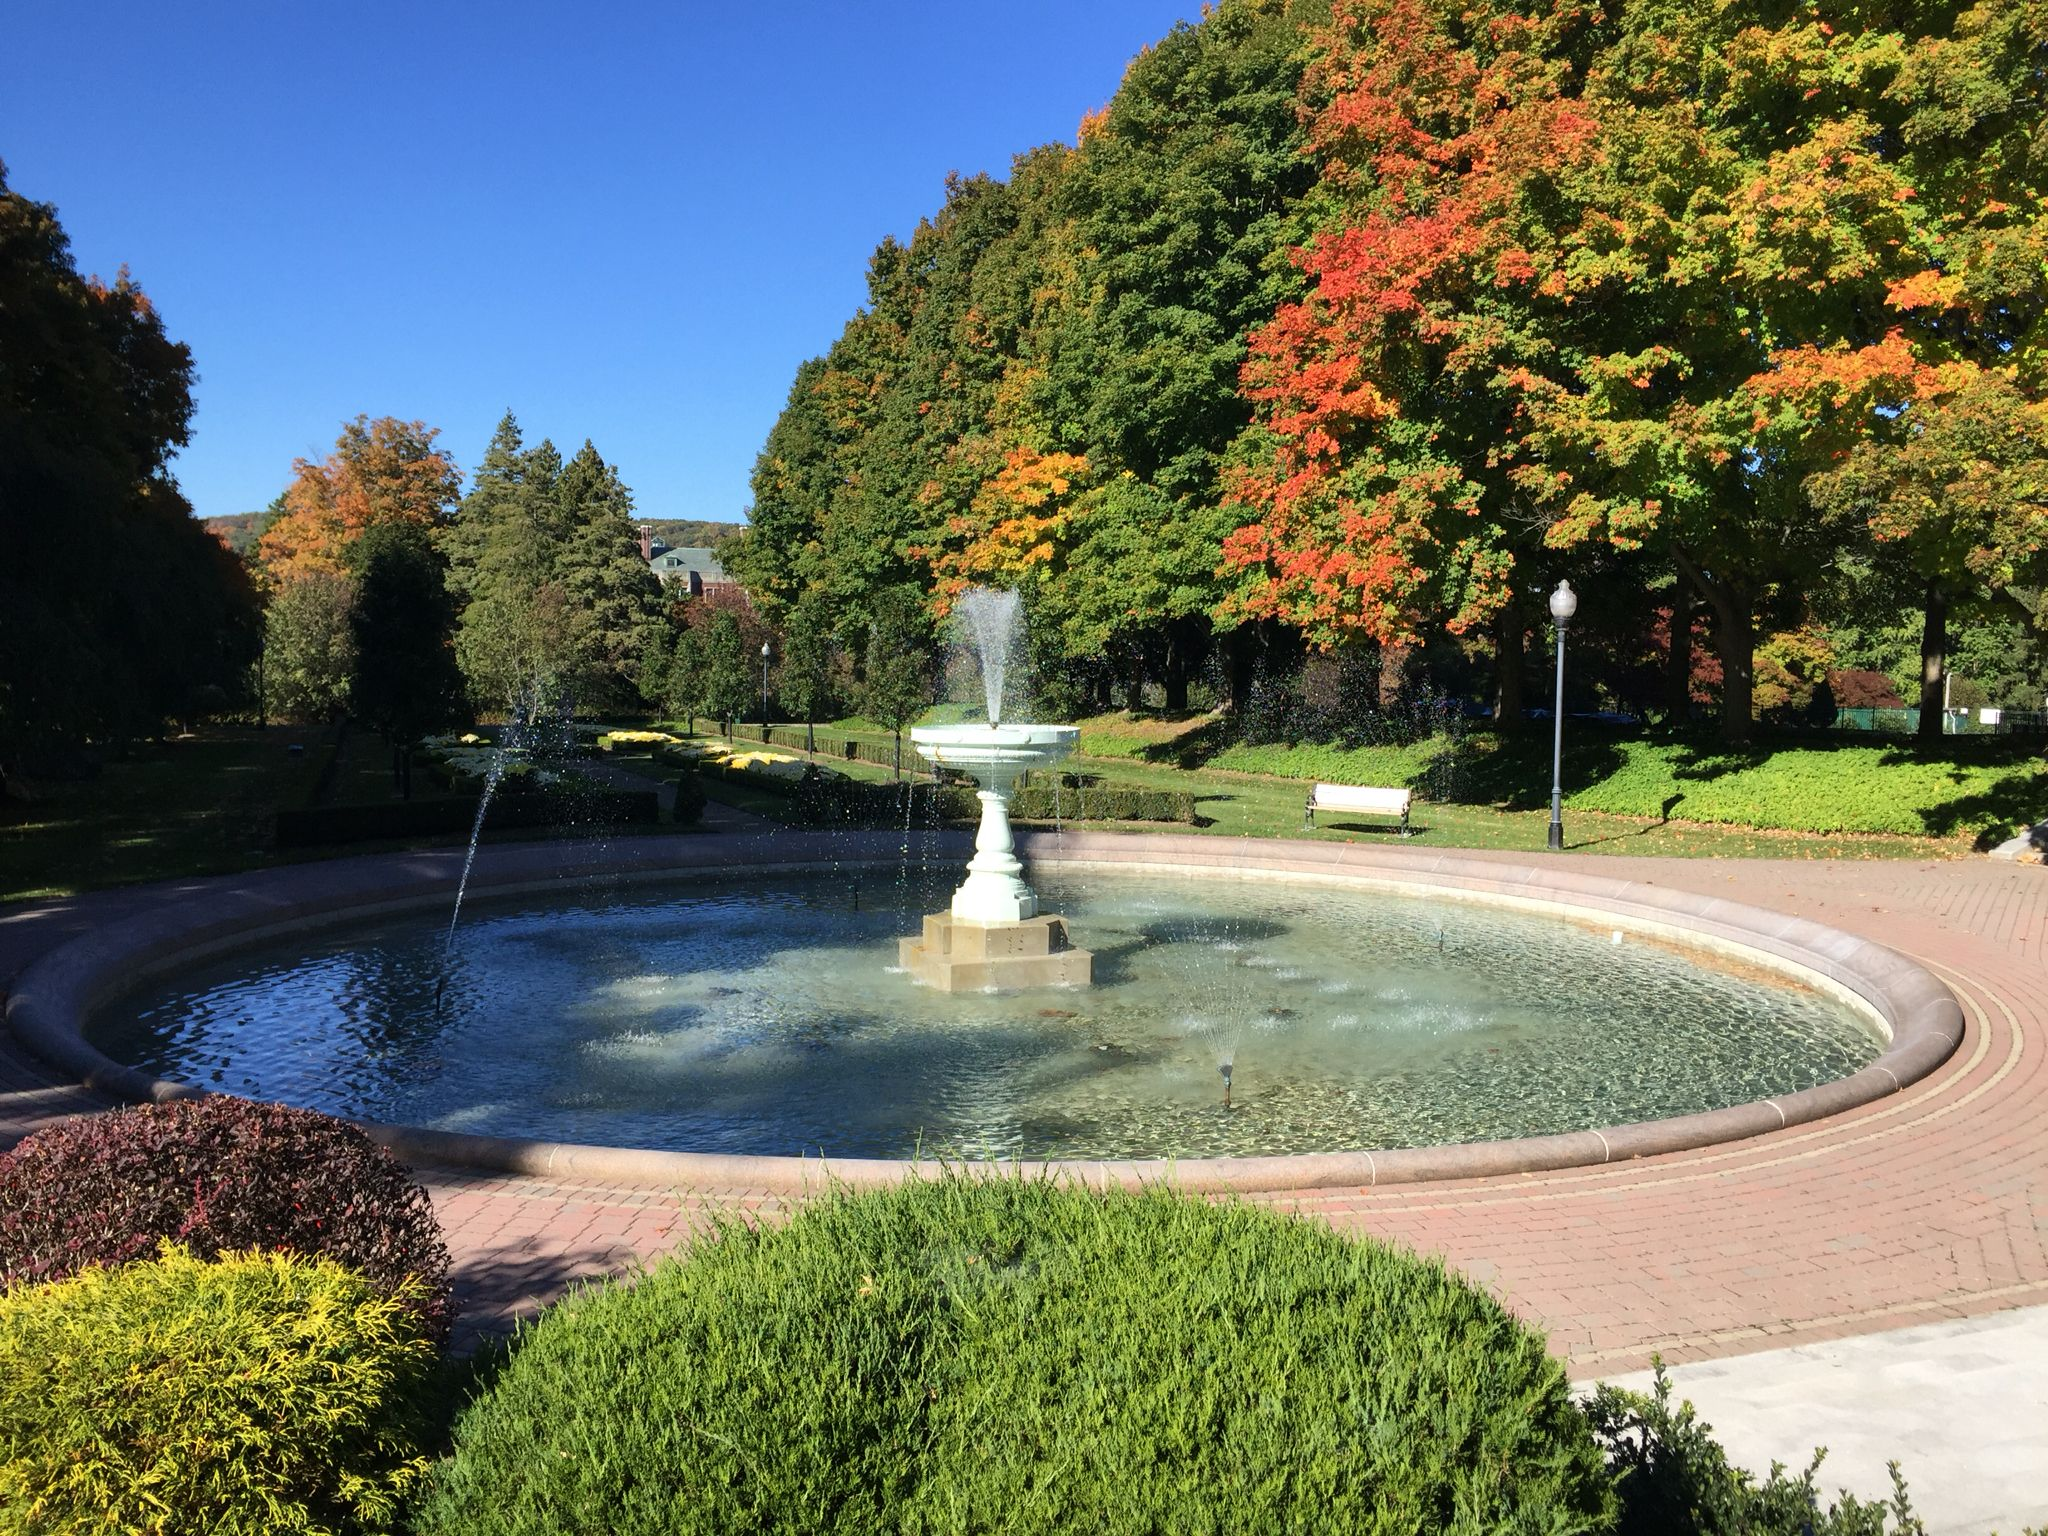 grand fountain in formal